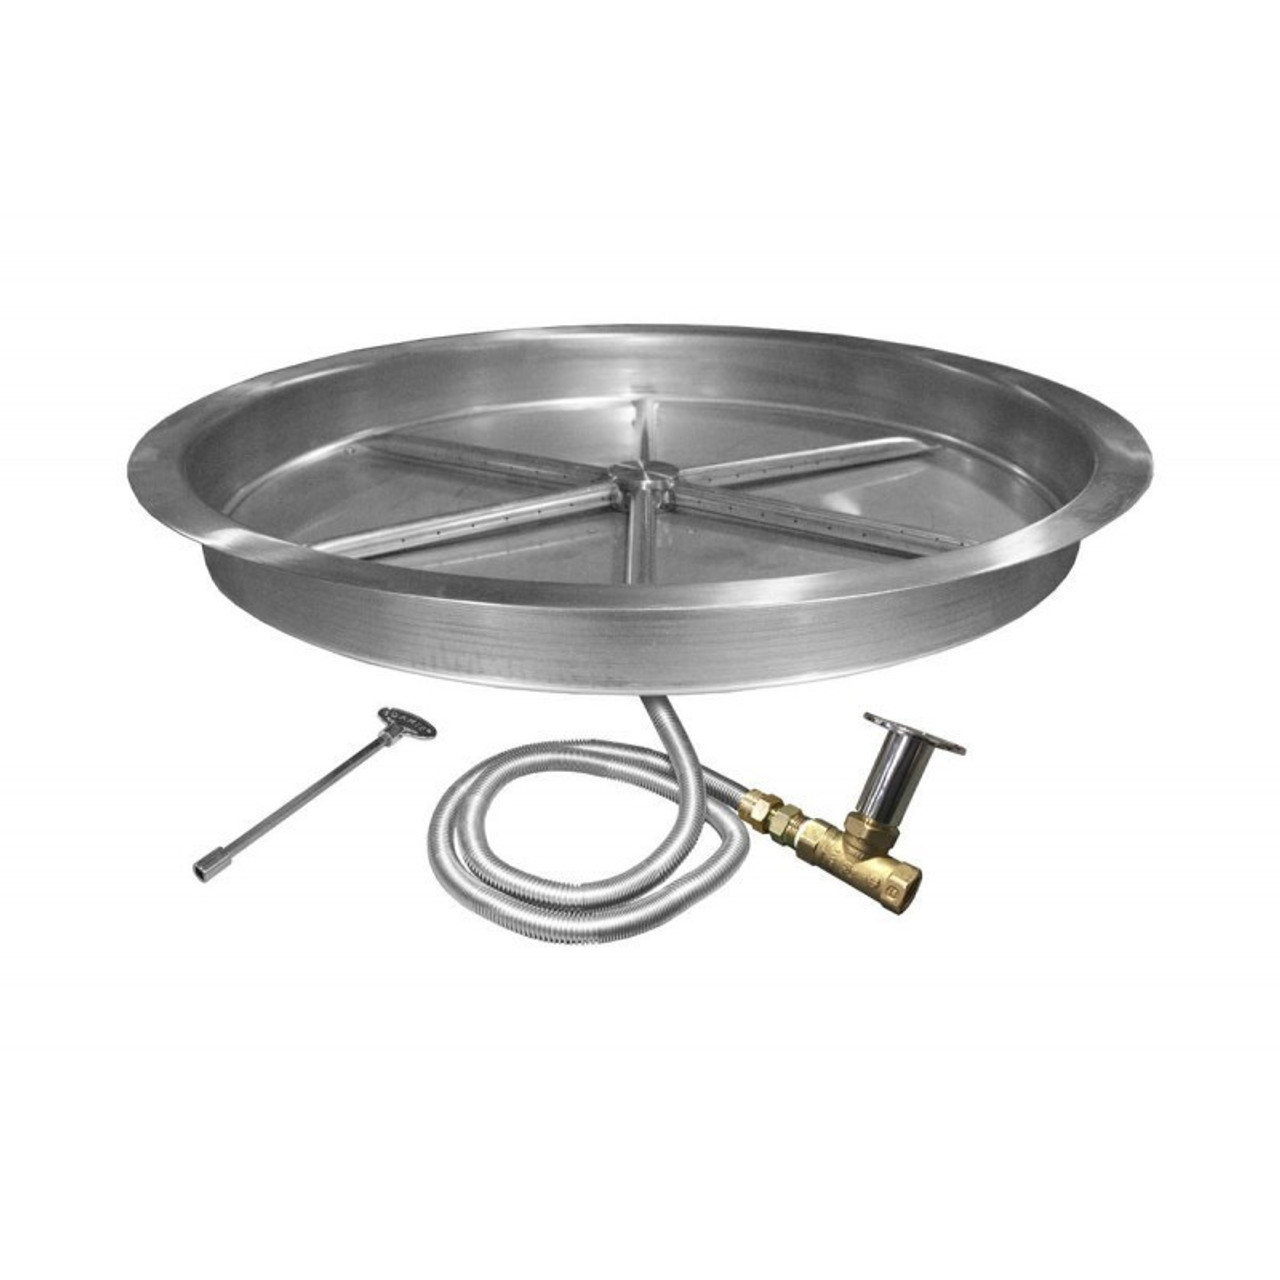 Firegear Match Light Gas Fire Pit Burner Kit Round Bowl Pan 29 Inch